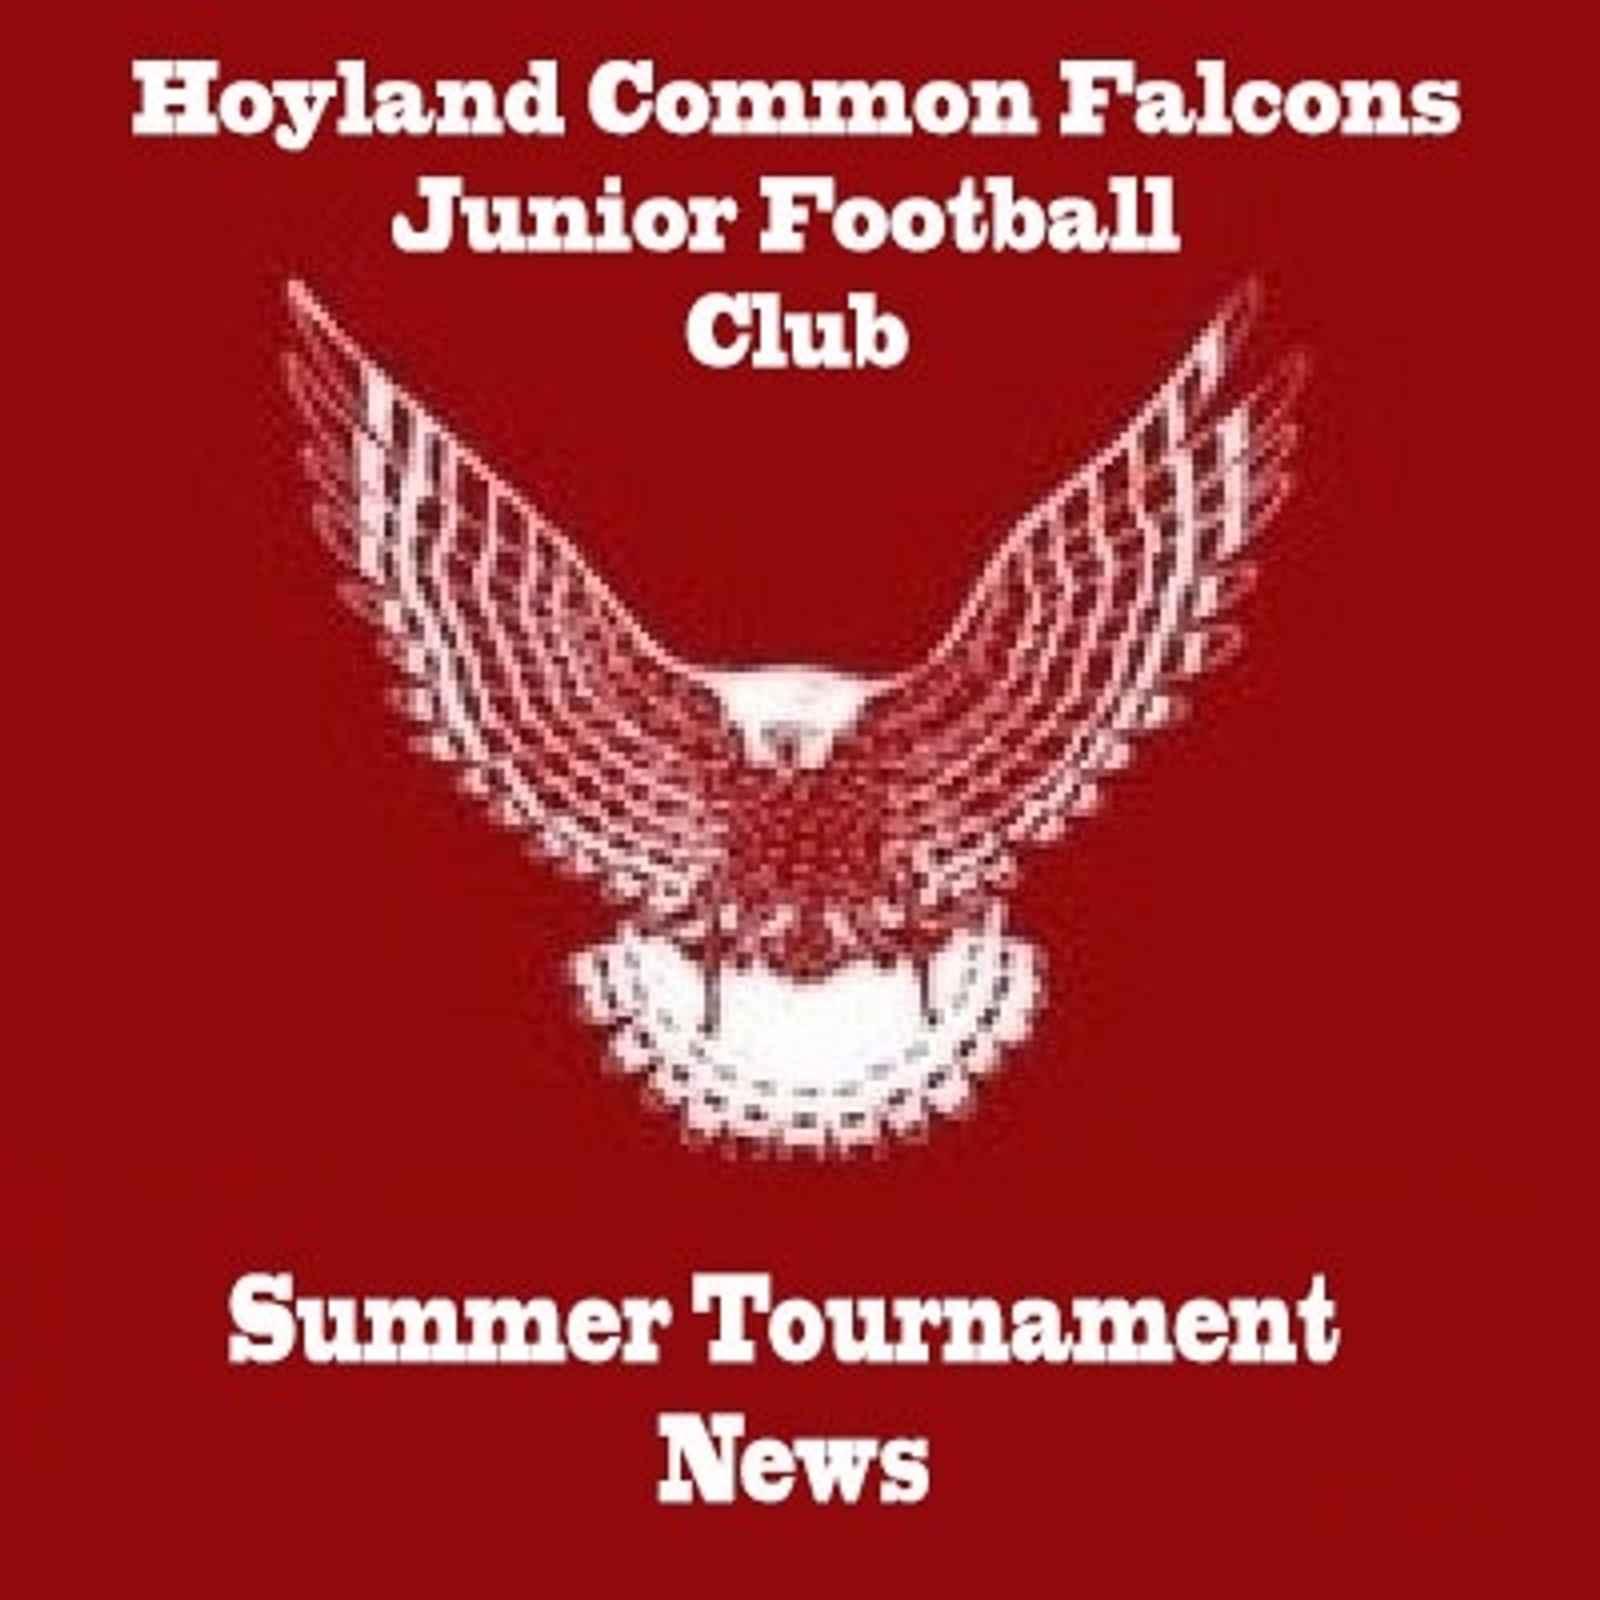 Hoyland Common Falcons Summer Football Tournament